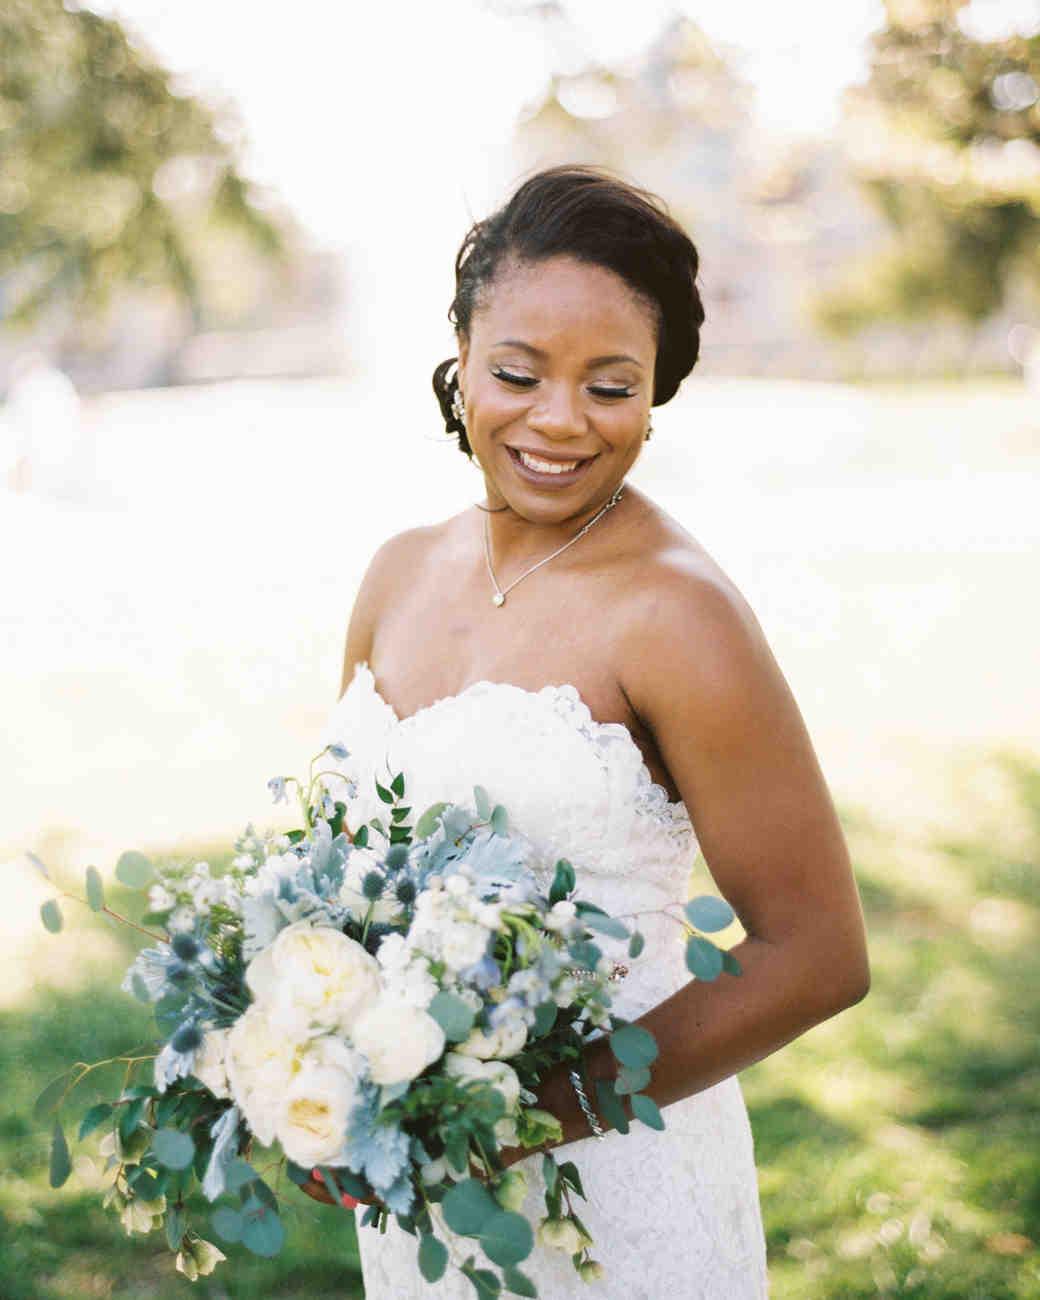 wedding bride holding bouquet white blue flowers